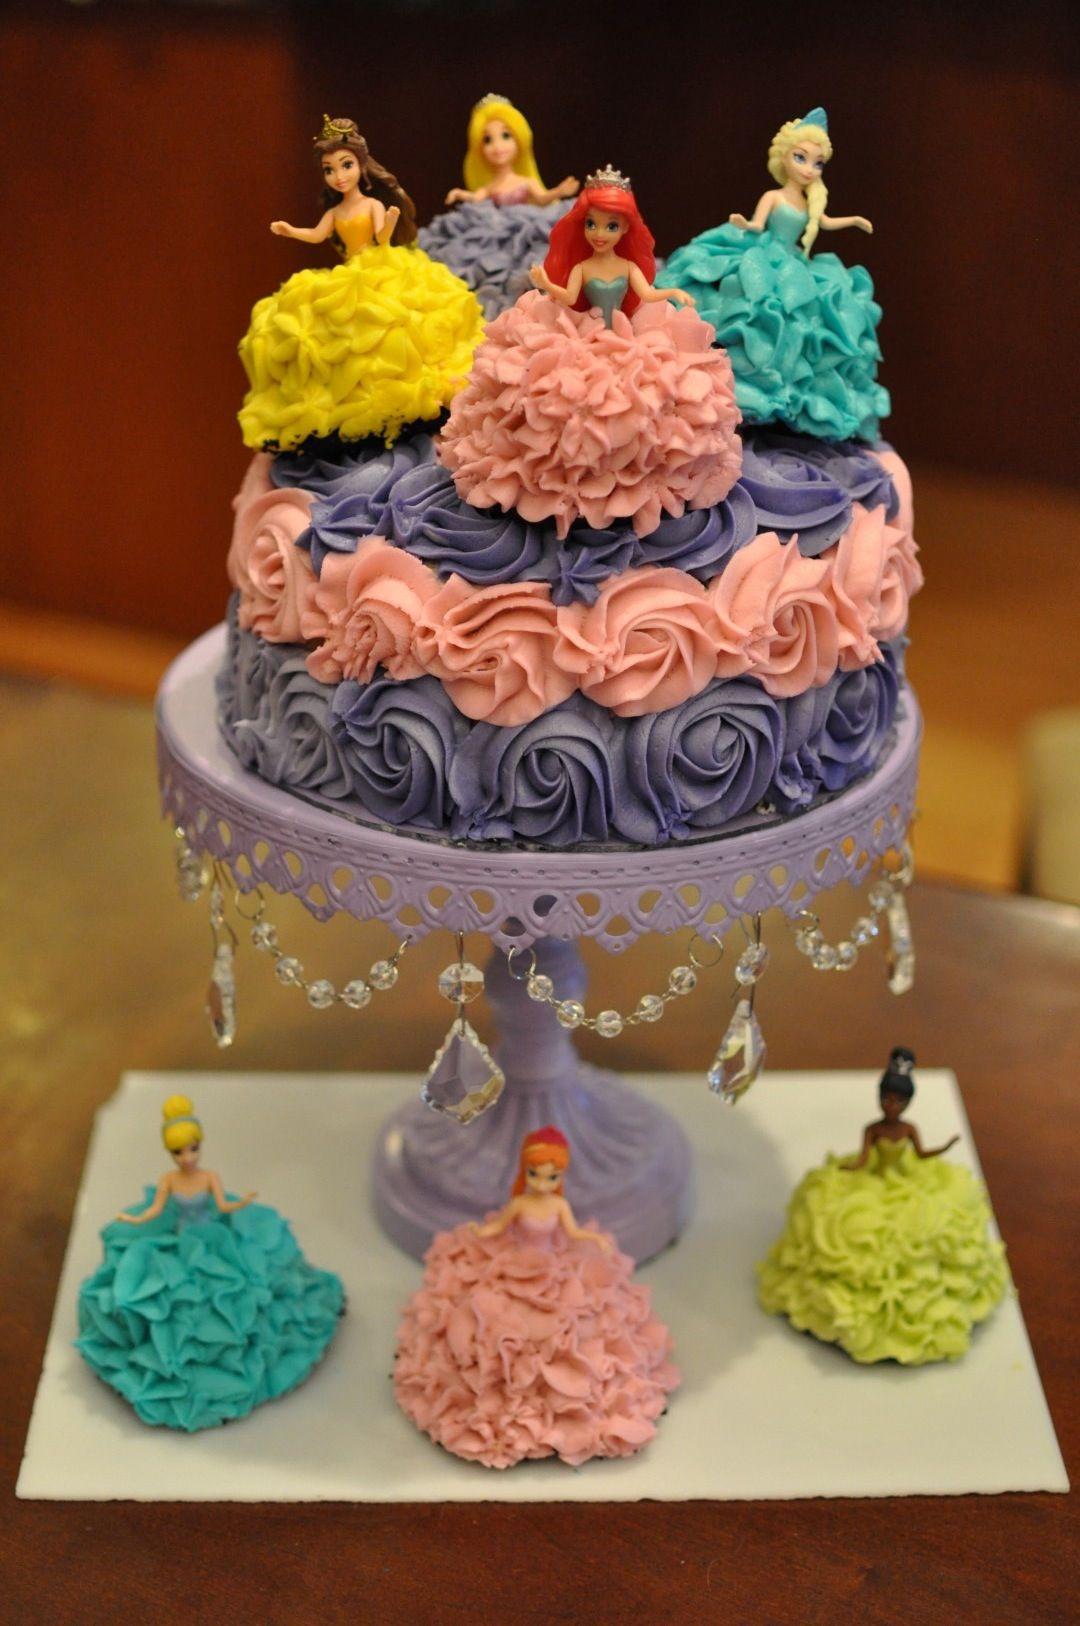 Disney Frozen Princess Cake And Cupcakes With Ariel Elsa